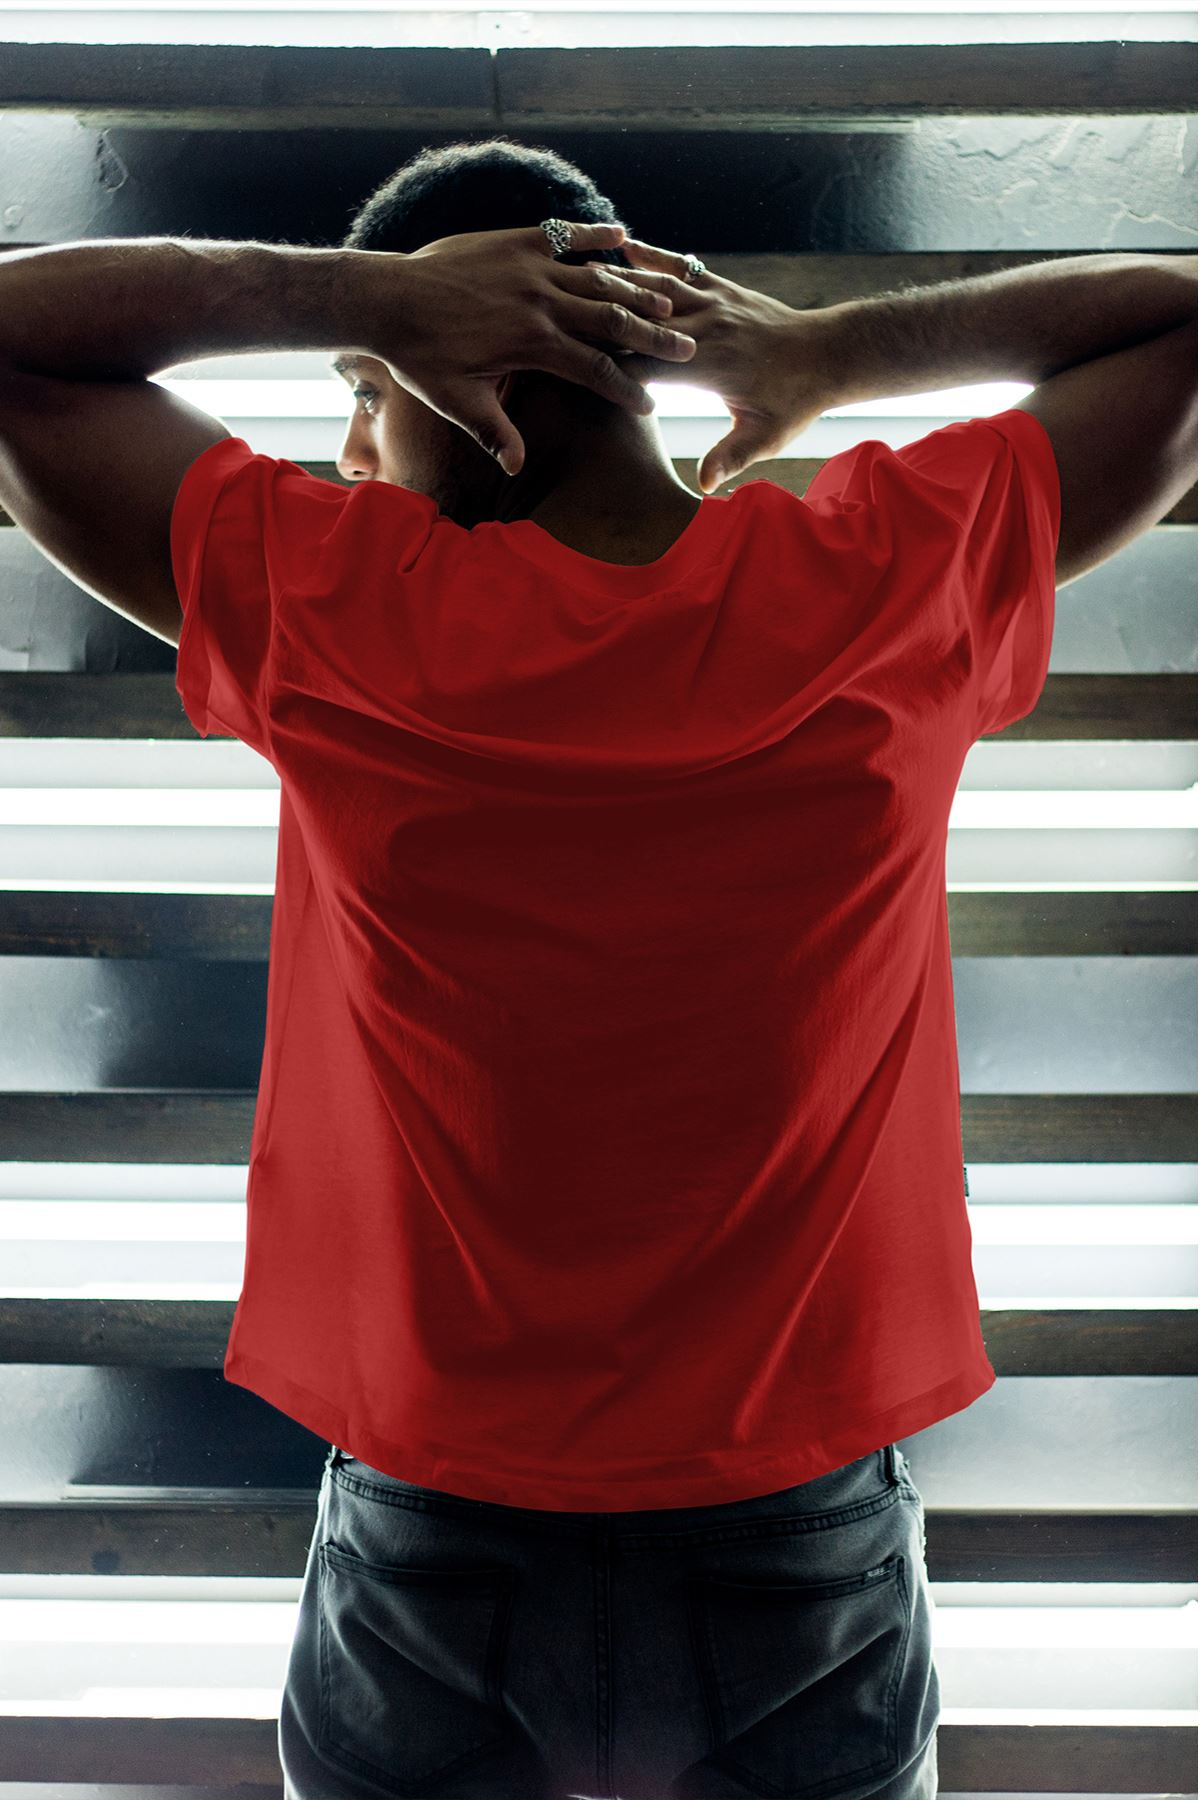 Boston Celtics 31 Kırmızı Erkek Oversize Tshirt - Tişört